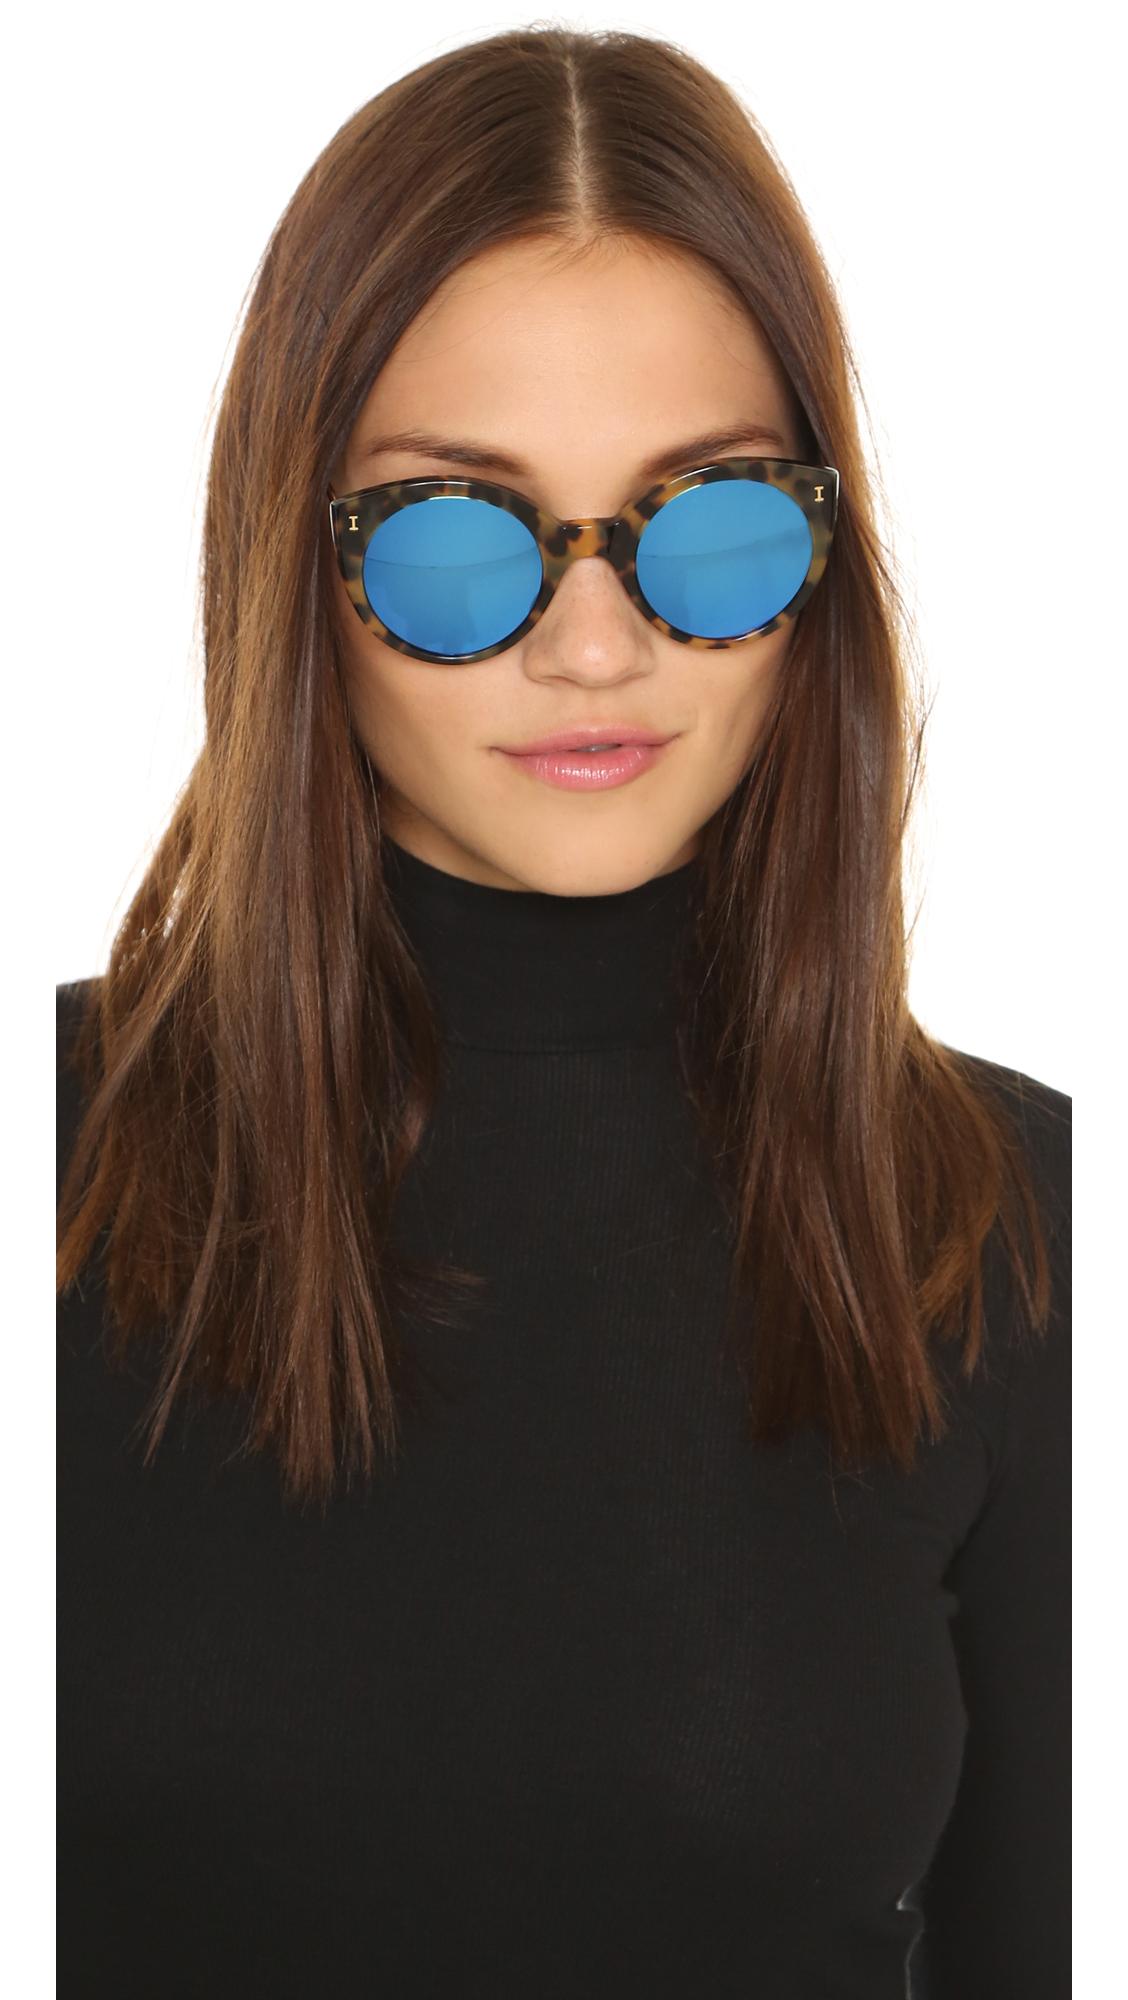 51641b89bb6 Illesteva Palm Beach Mirrored Sunglasses